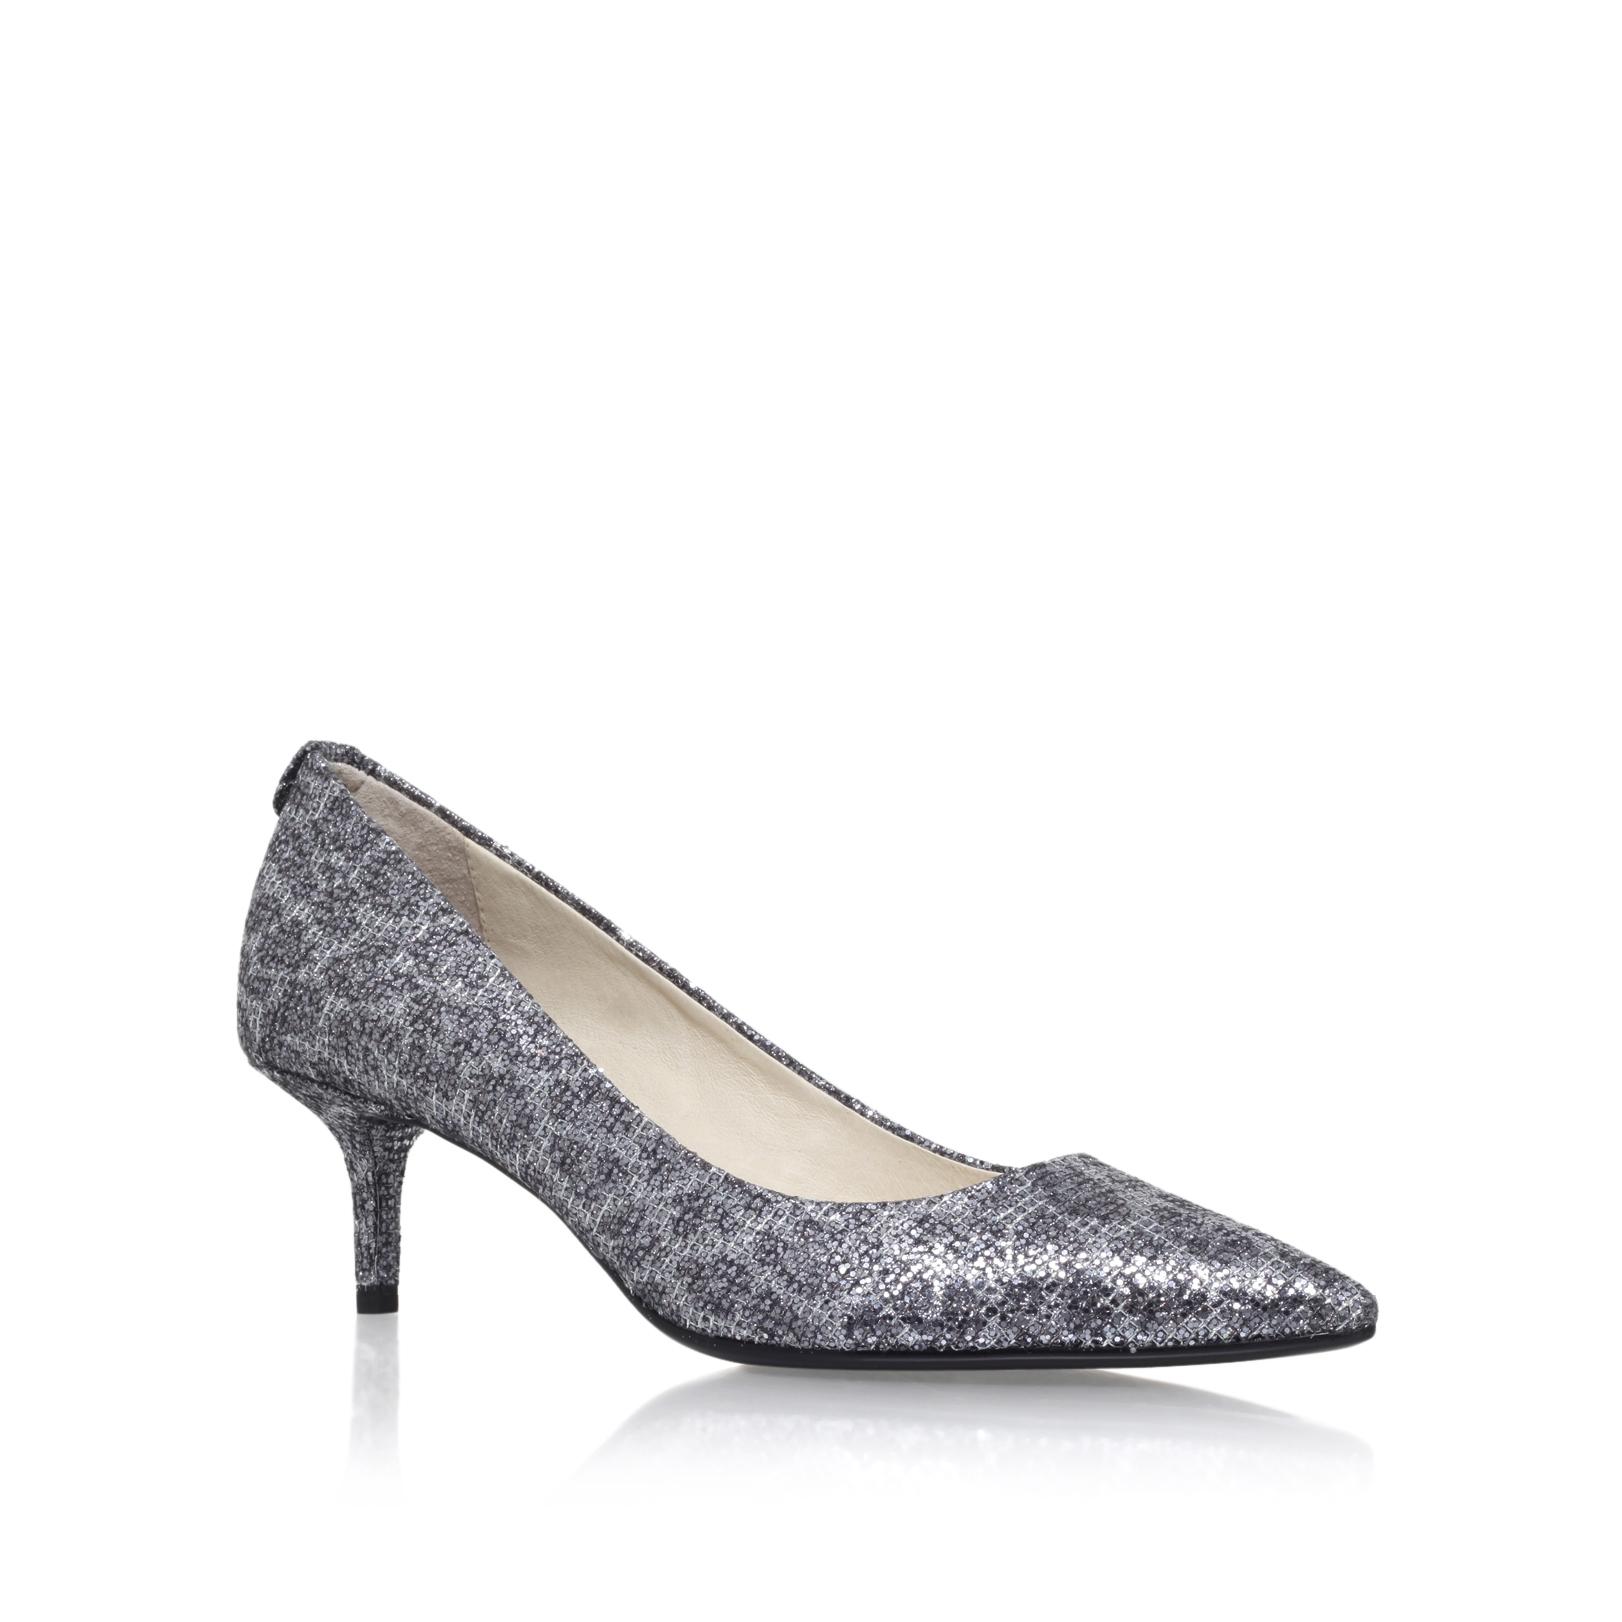 5abb8757e786 MK FLEX KITTEN PUMP Michael Michael Kors Flex Gunmetal Mid Heel Court Shoes  by MICHAEL MICHAEL KORS